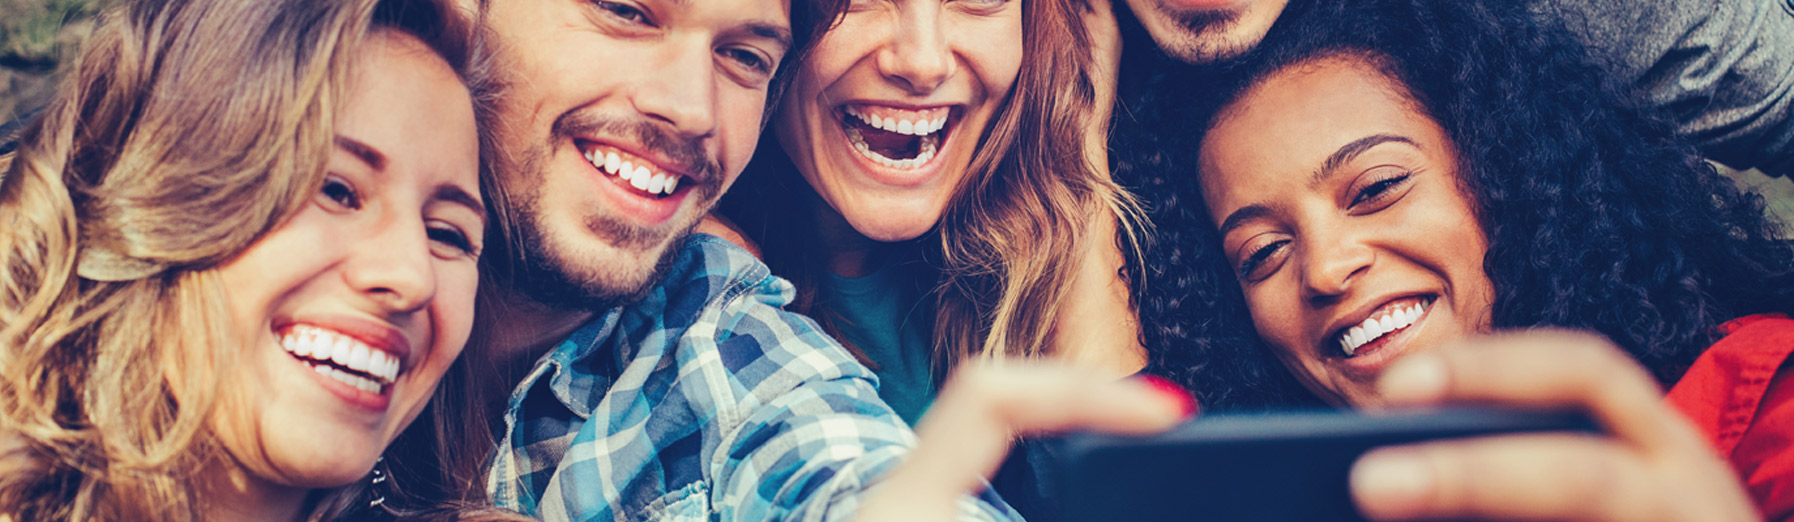 Selfies and Head Lice